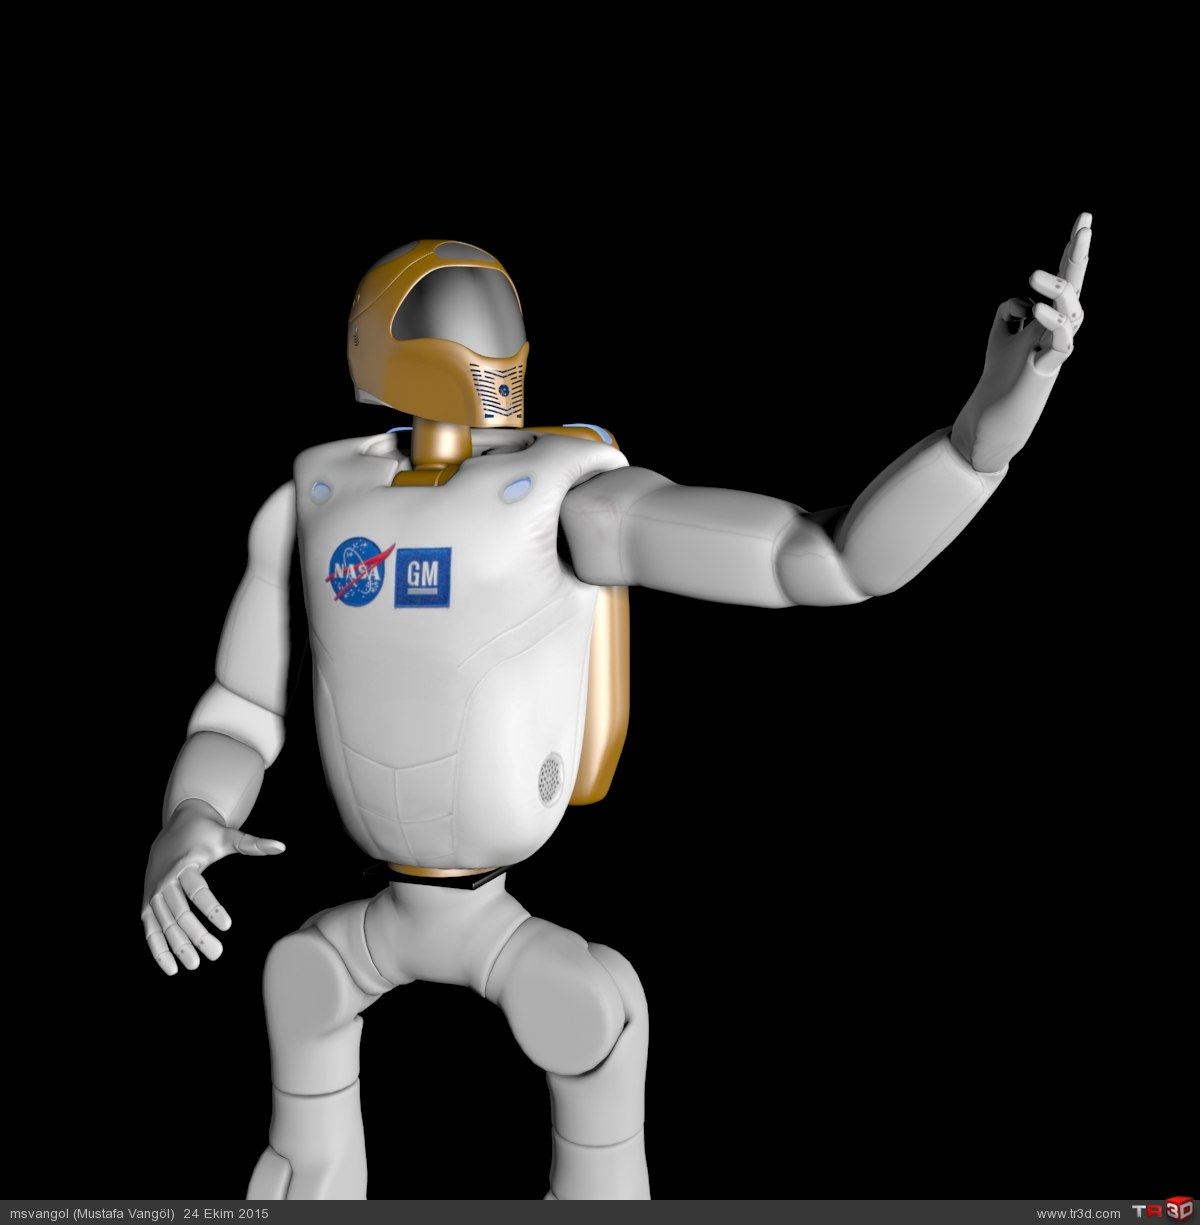 NASA ROBONAUT-2 MODEL (R2) 6